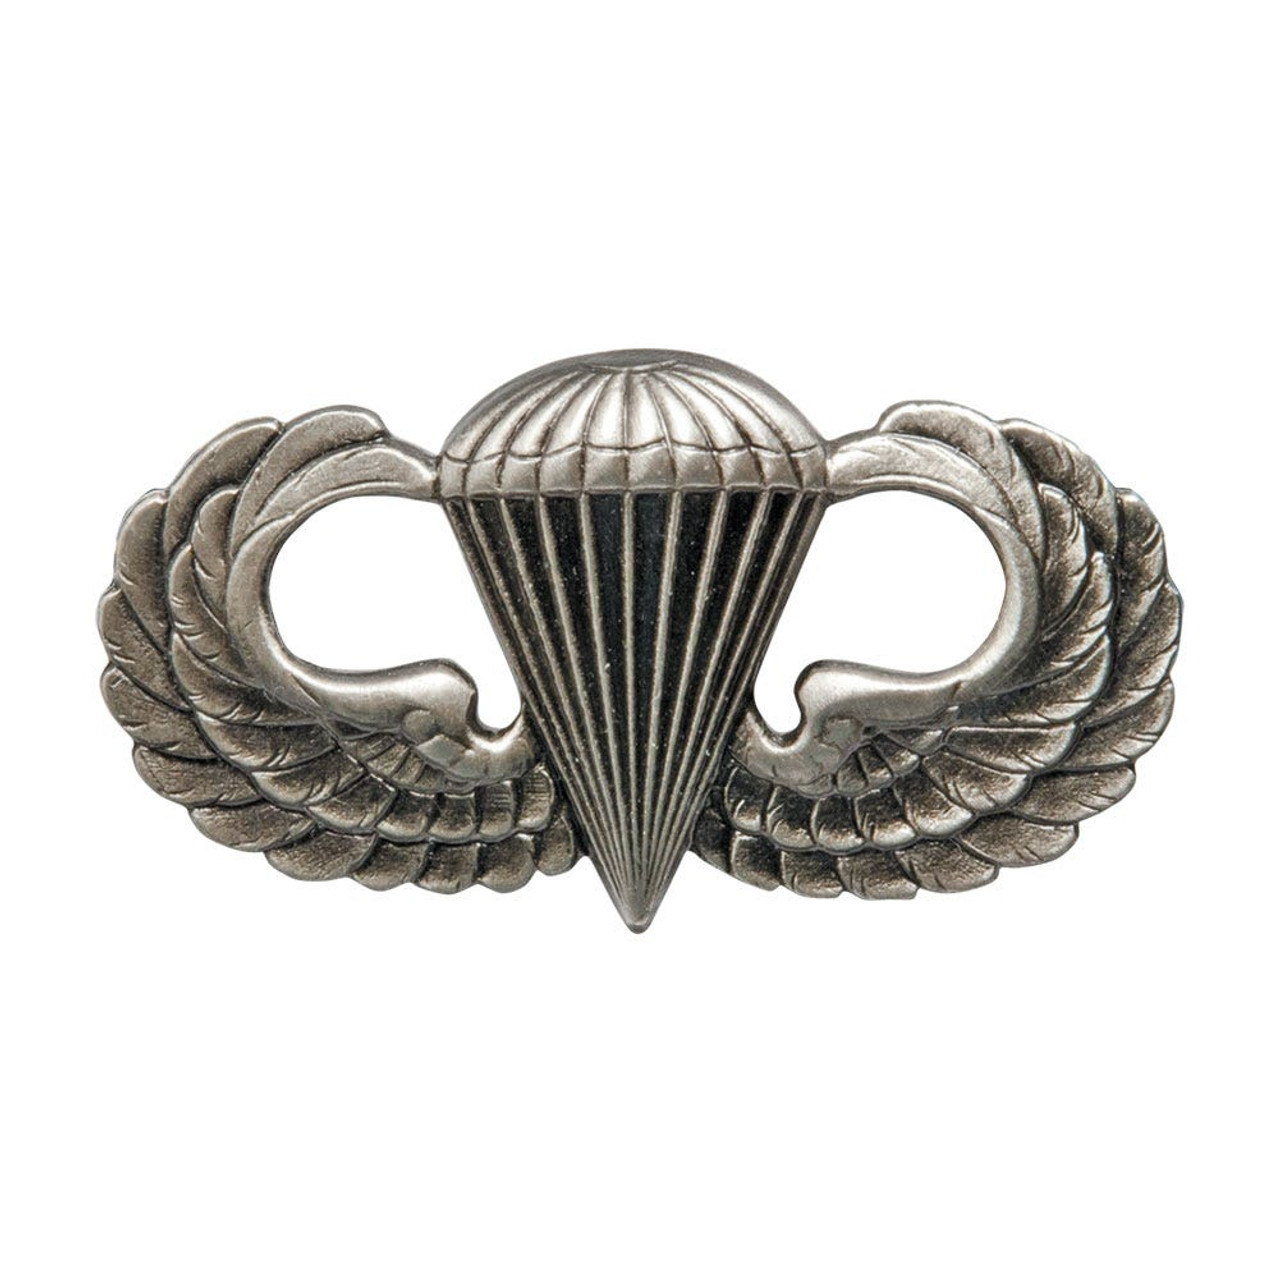 Basic Airborne Wings